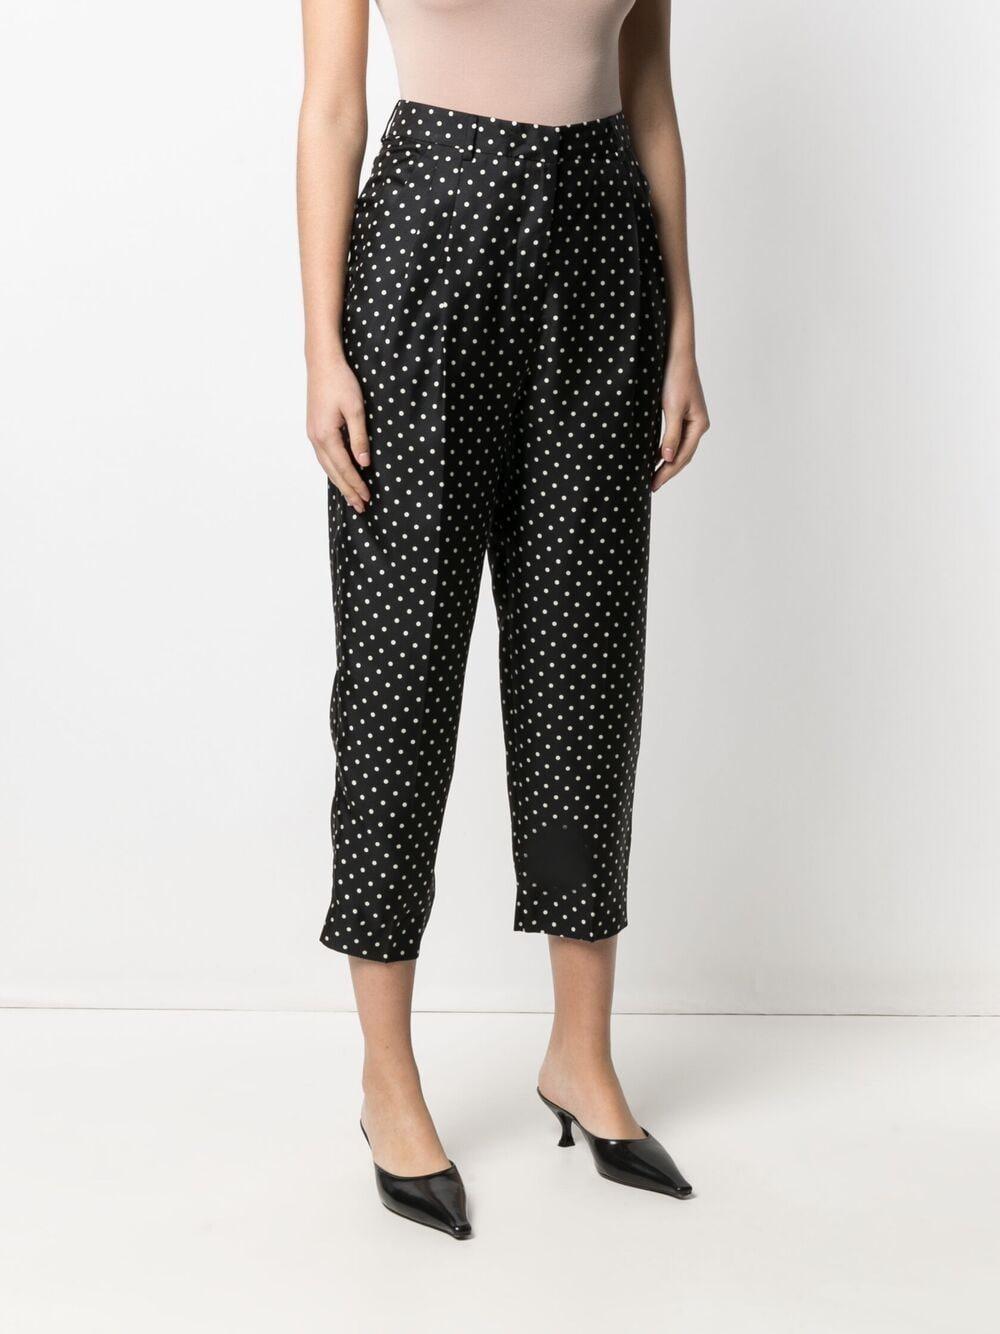 Pantaloni cropped in seta nera con stampa a pois ALBERTO BIANI   Pantaloni   CC802-SE313390